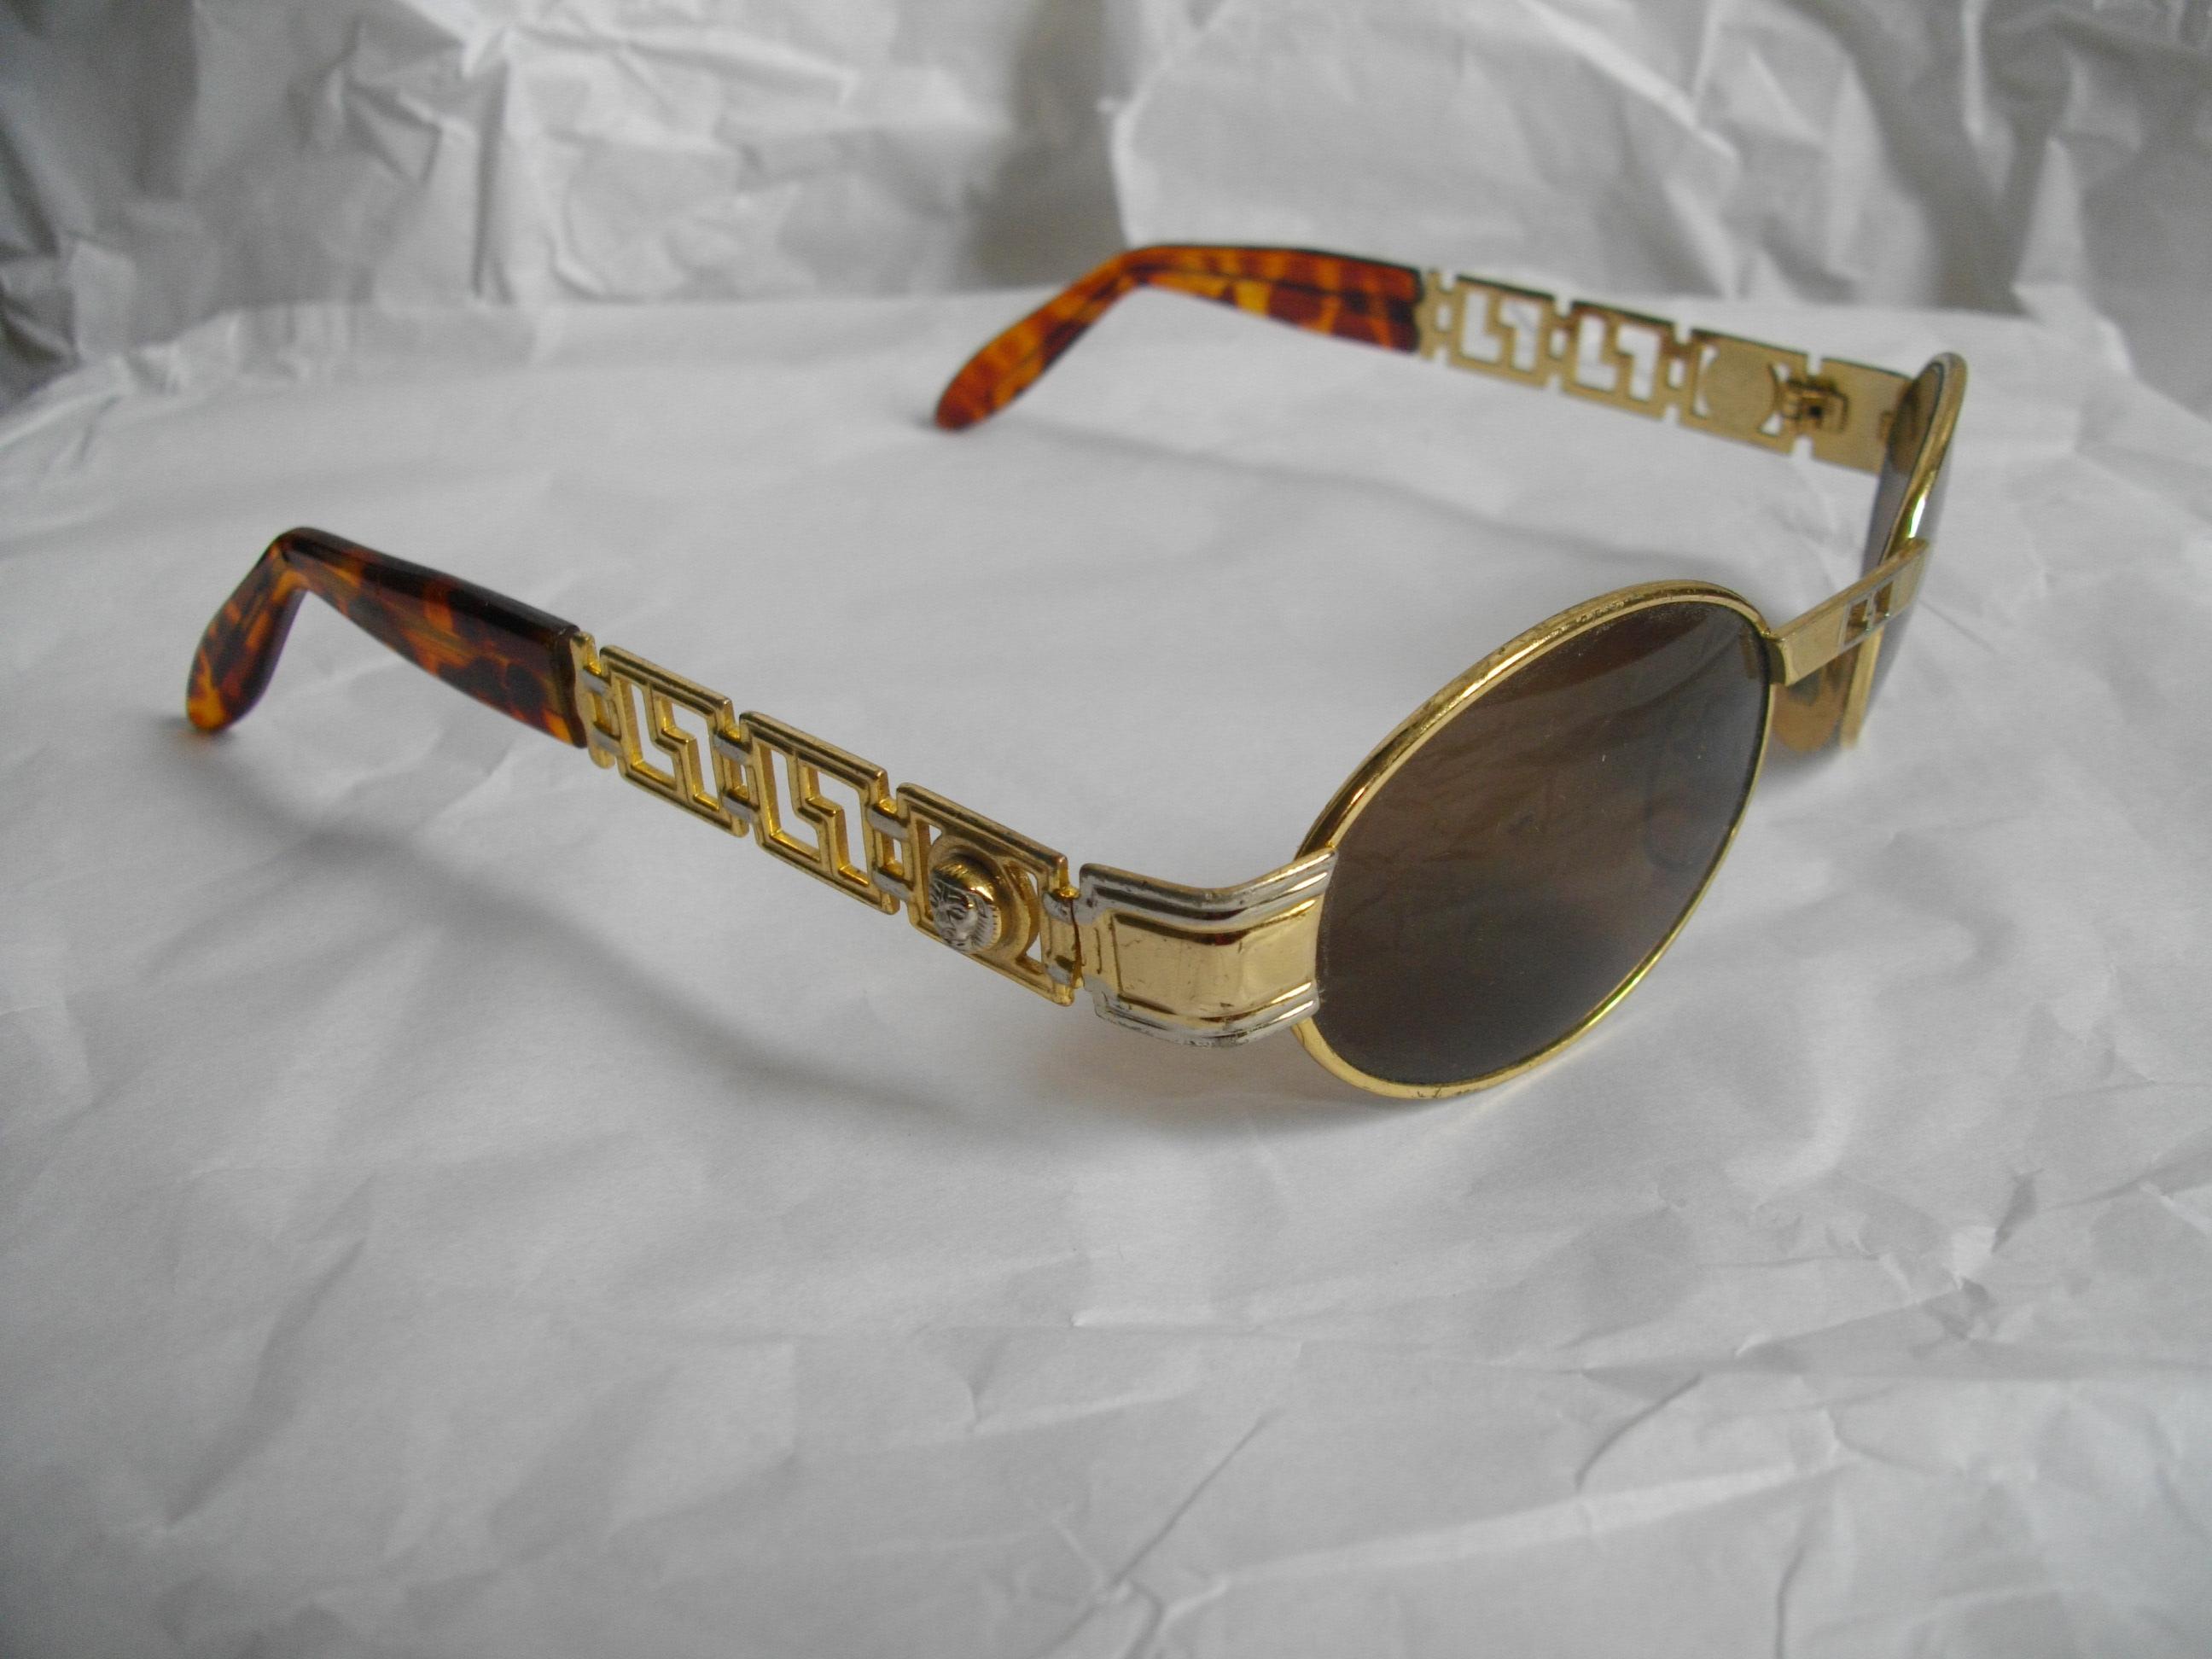 Frame glasses versace - Vintage Trill Gold Silver Tortoise Shell Sunglasses